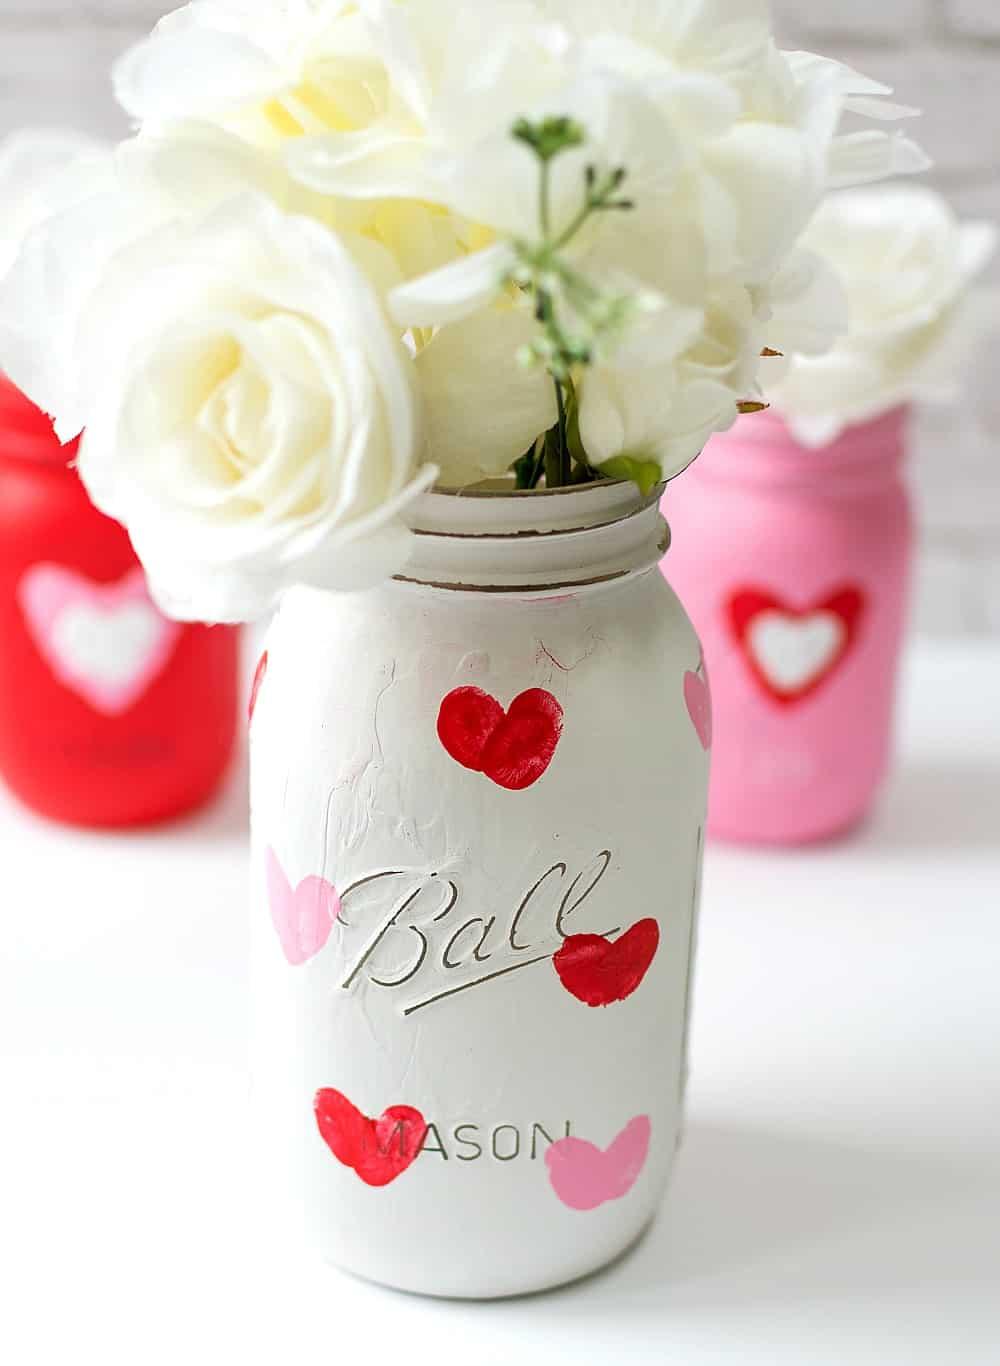 Valentine-Kid-Craft-Idea-Thumbprint-Heart-Mason-Jar-Vases